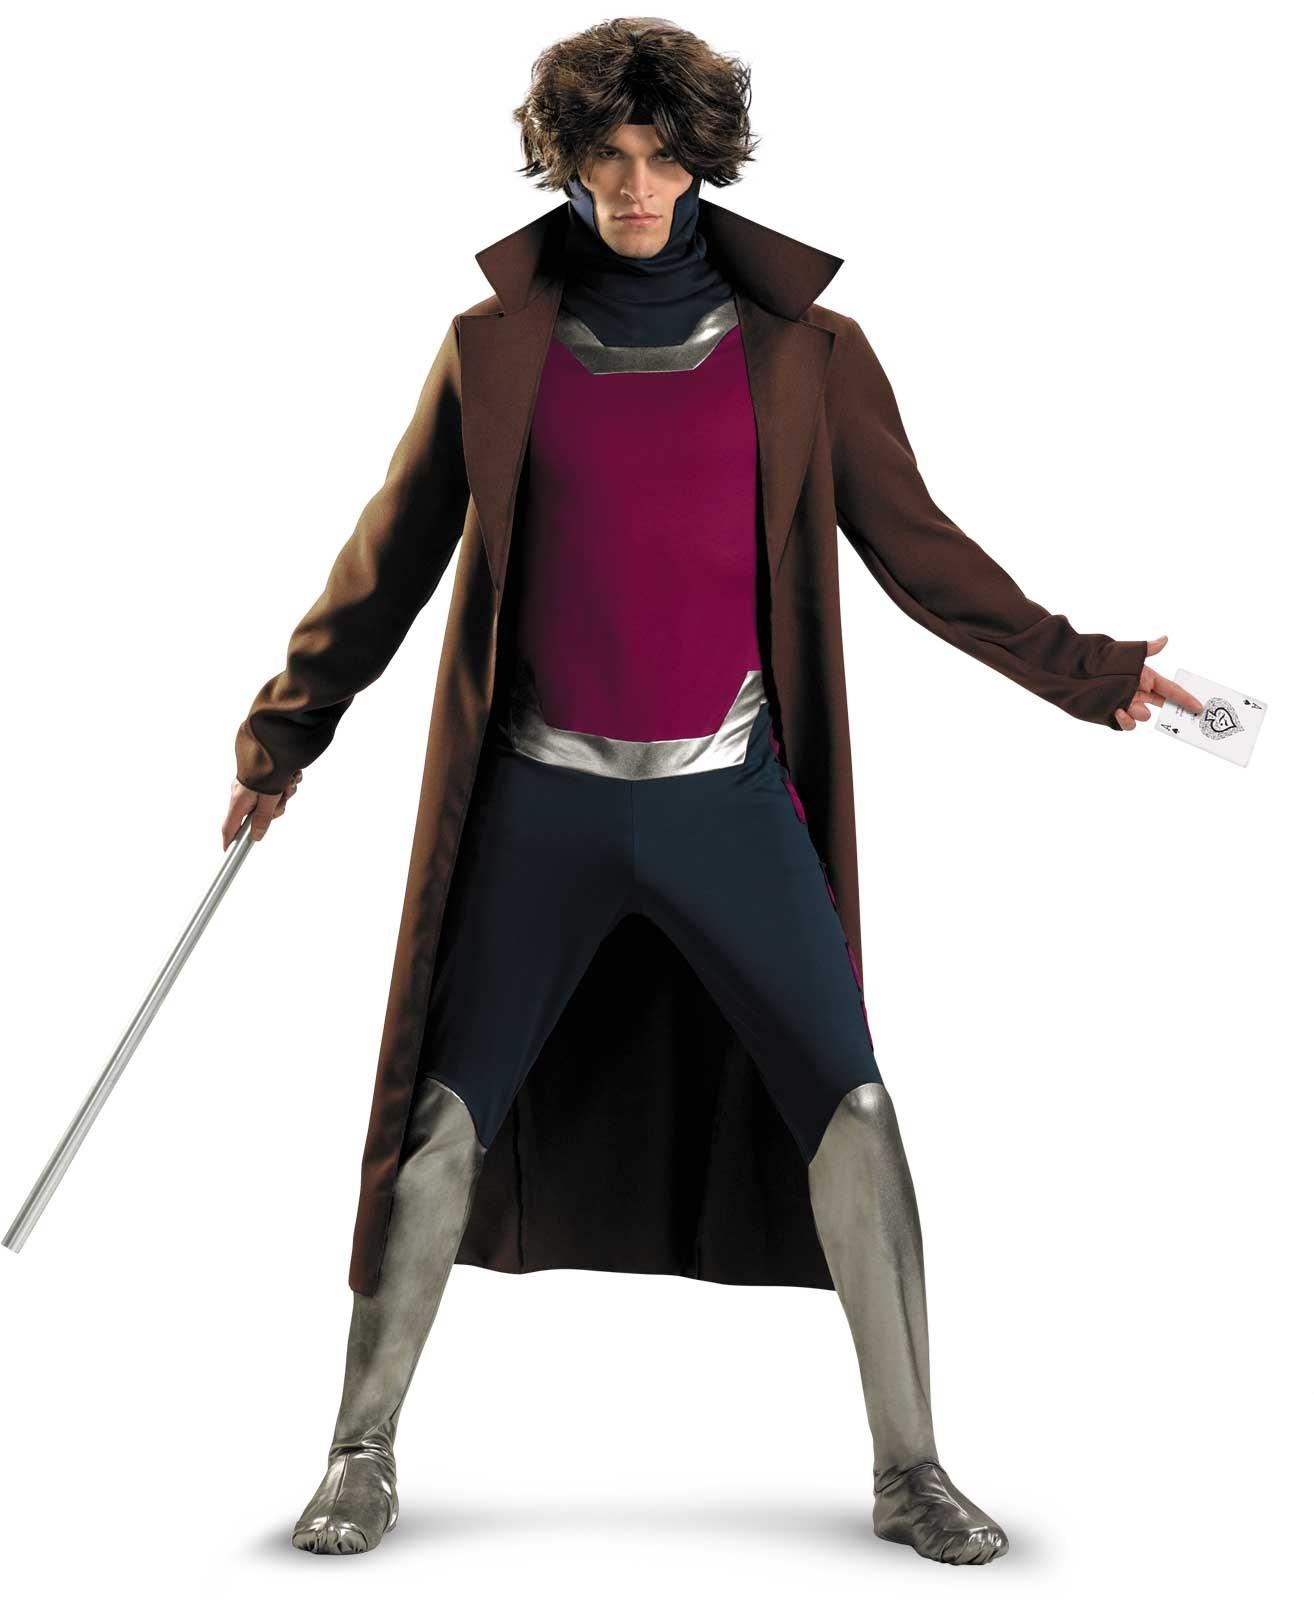 Image of X-Men Gambit Adult Costume